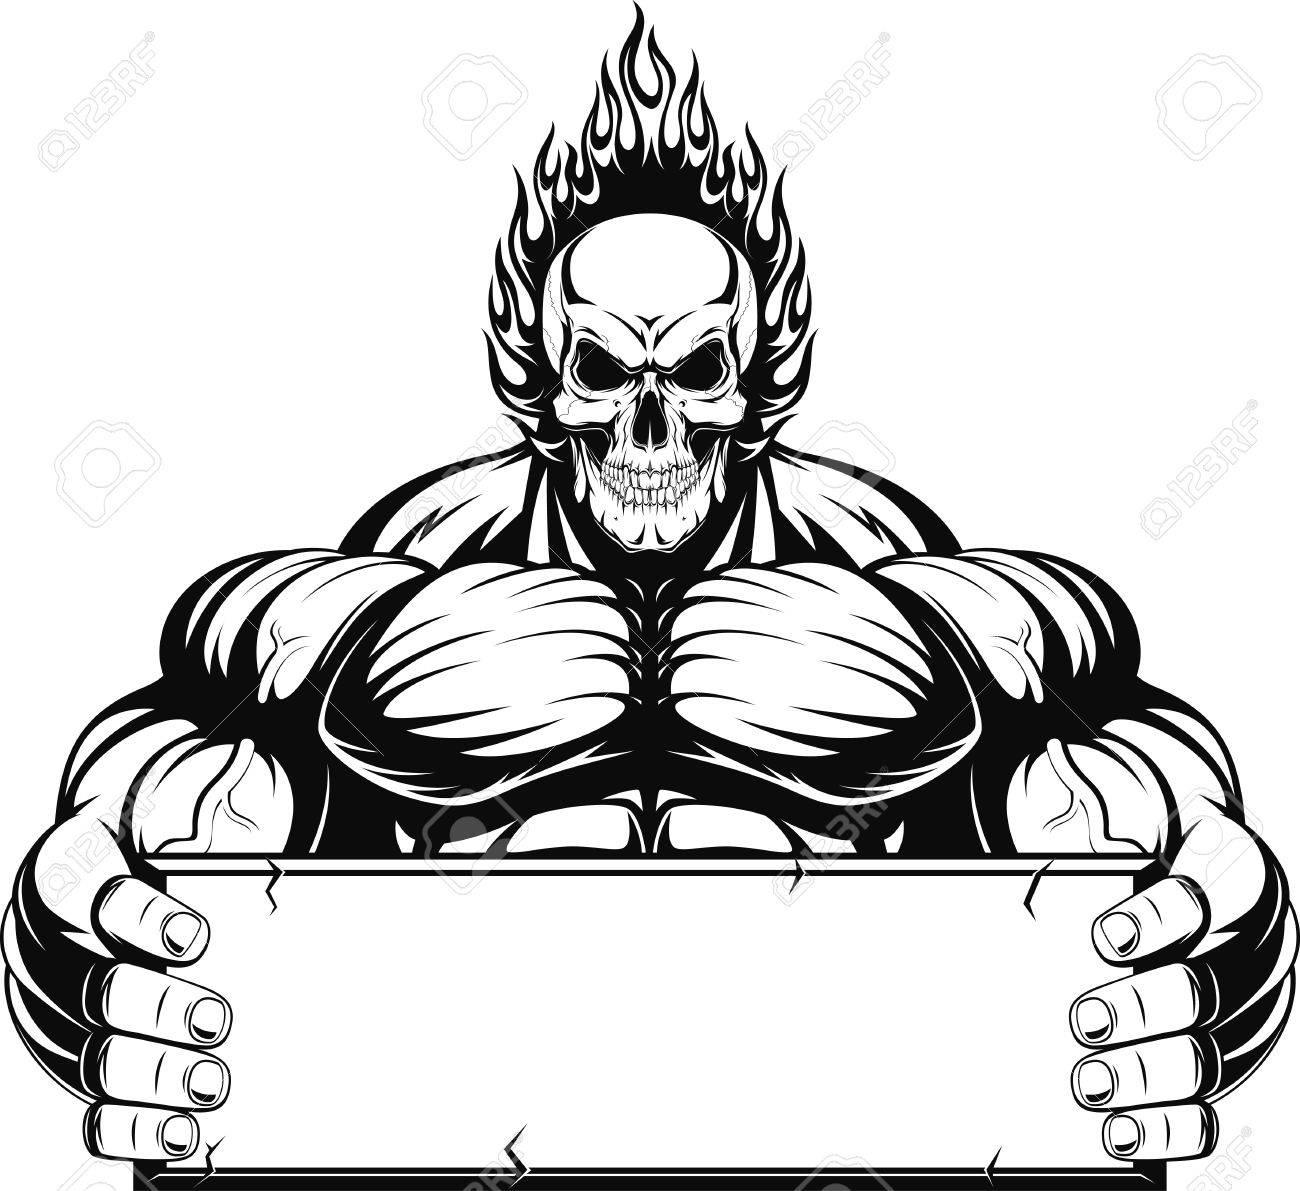 1300x1191 Vector Illustration, Outline A Bodybuilder, A Fiery Skull